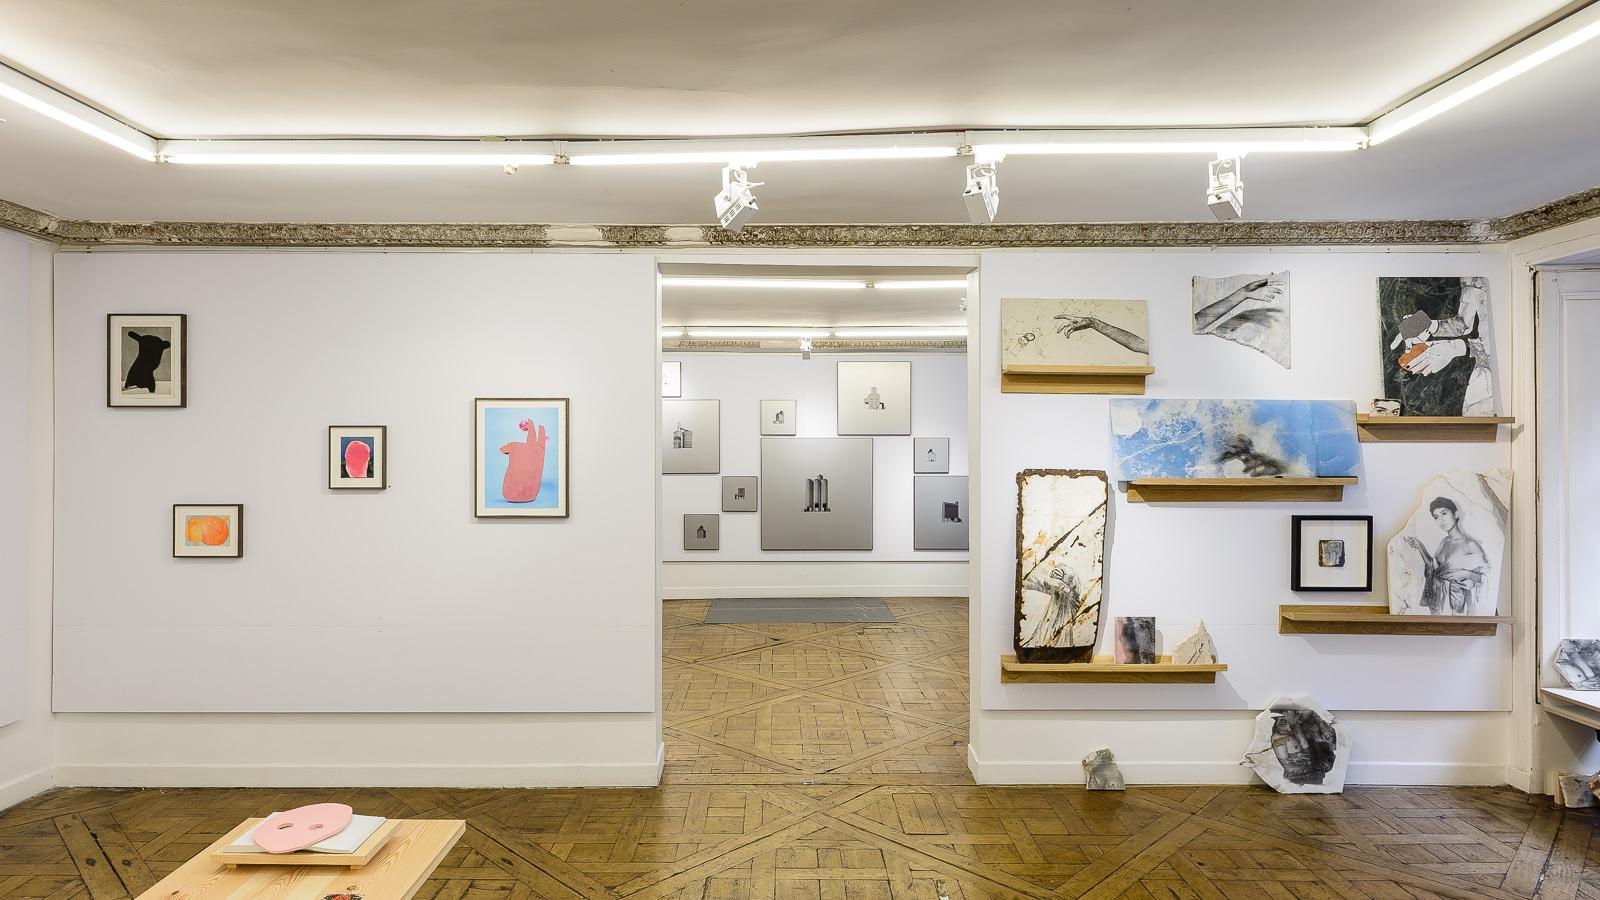 Vue d'exposition Salon Approche - 2018 _ Alice Guittard_Double V Gallery © Grégory Copitet.jpg